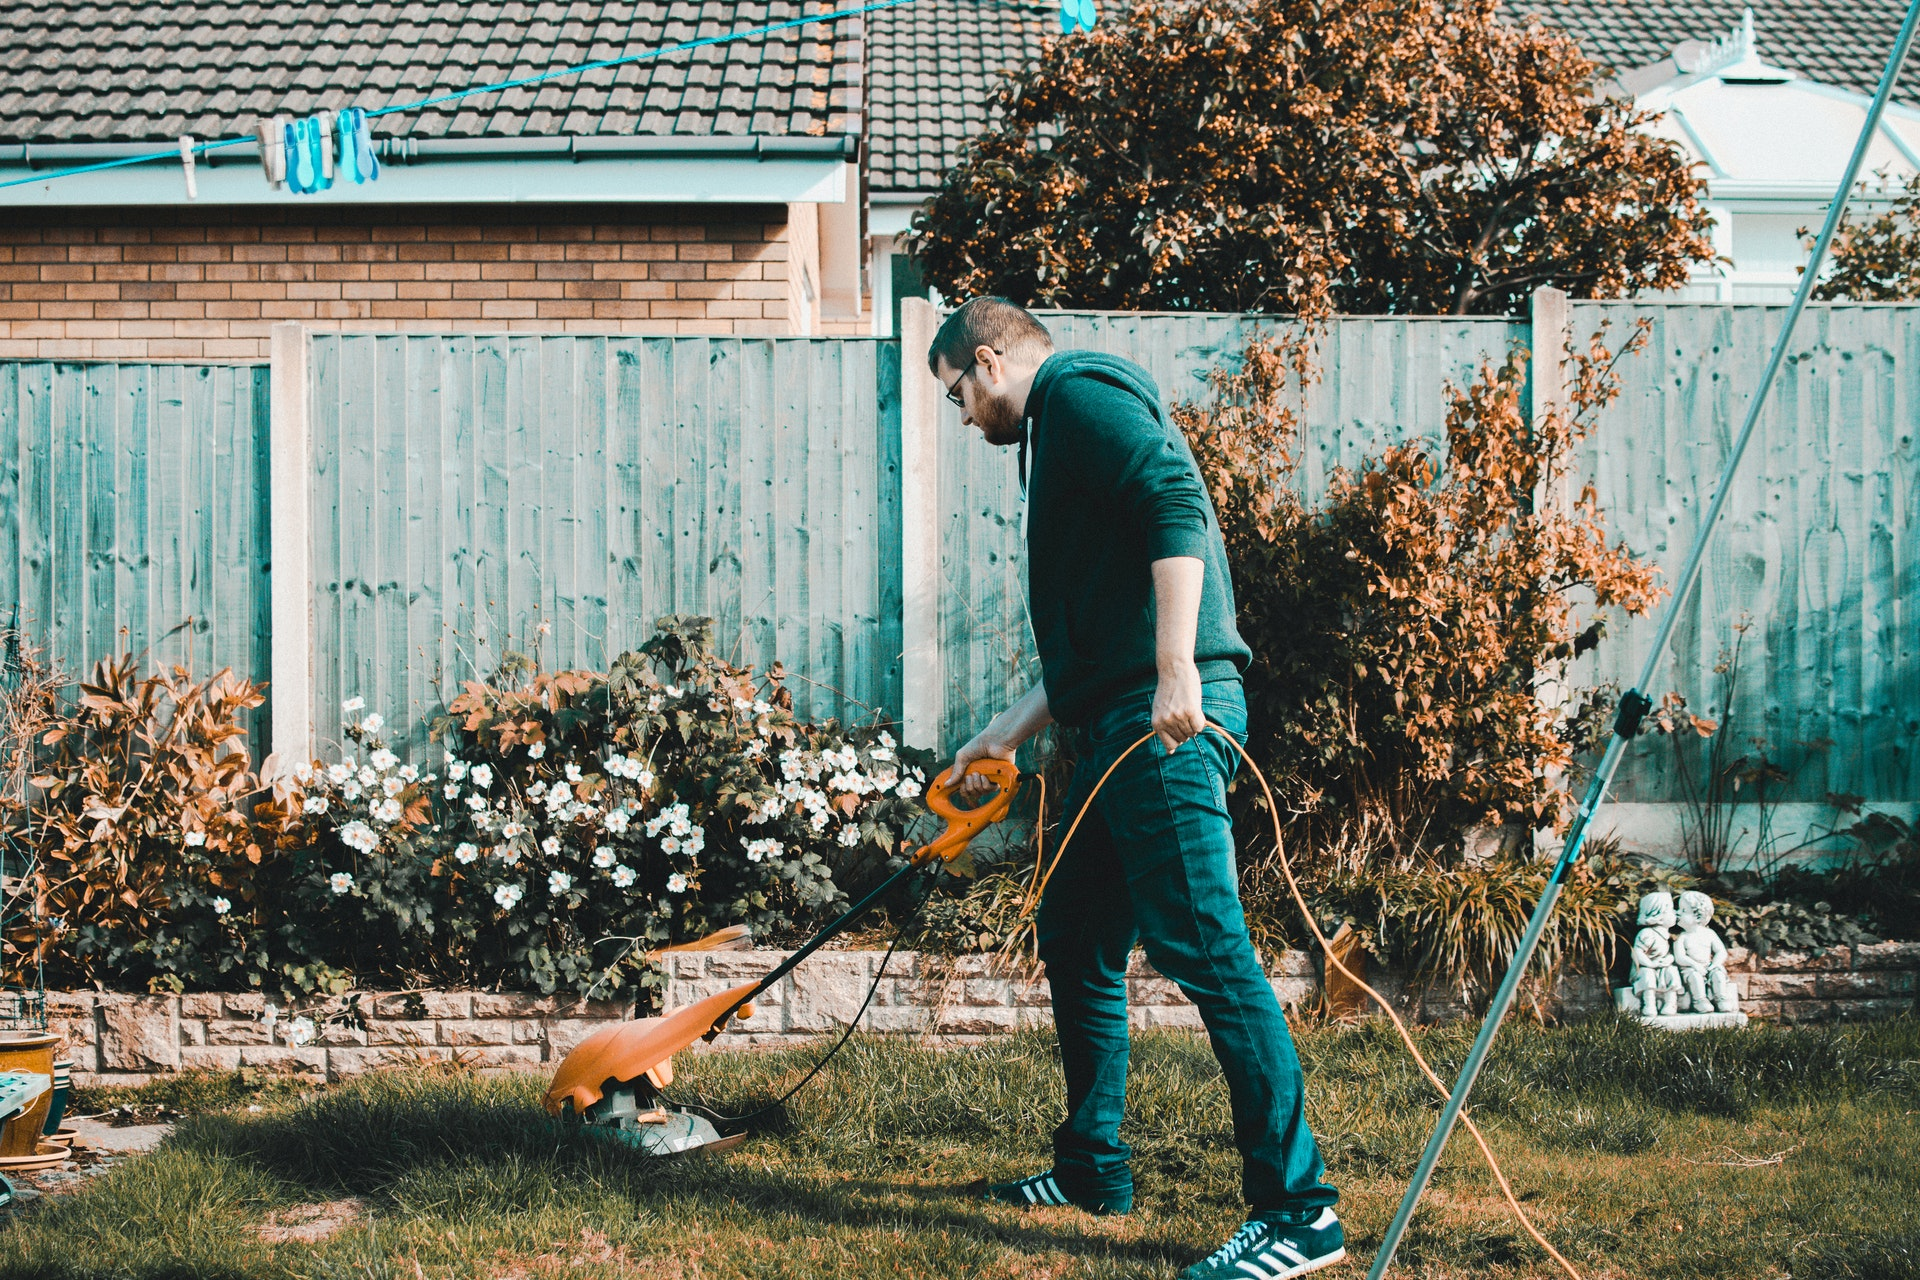 Man doing the gardening